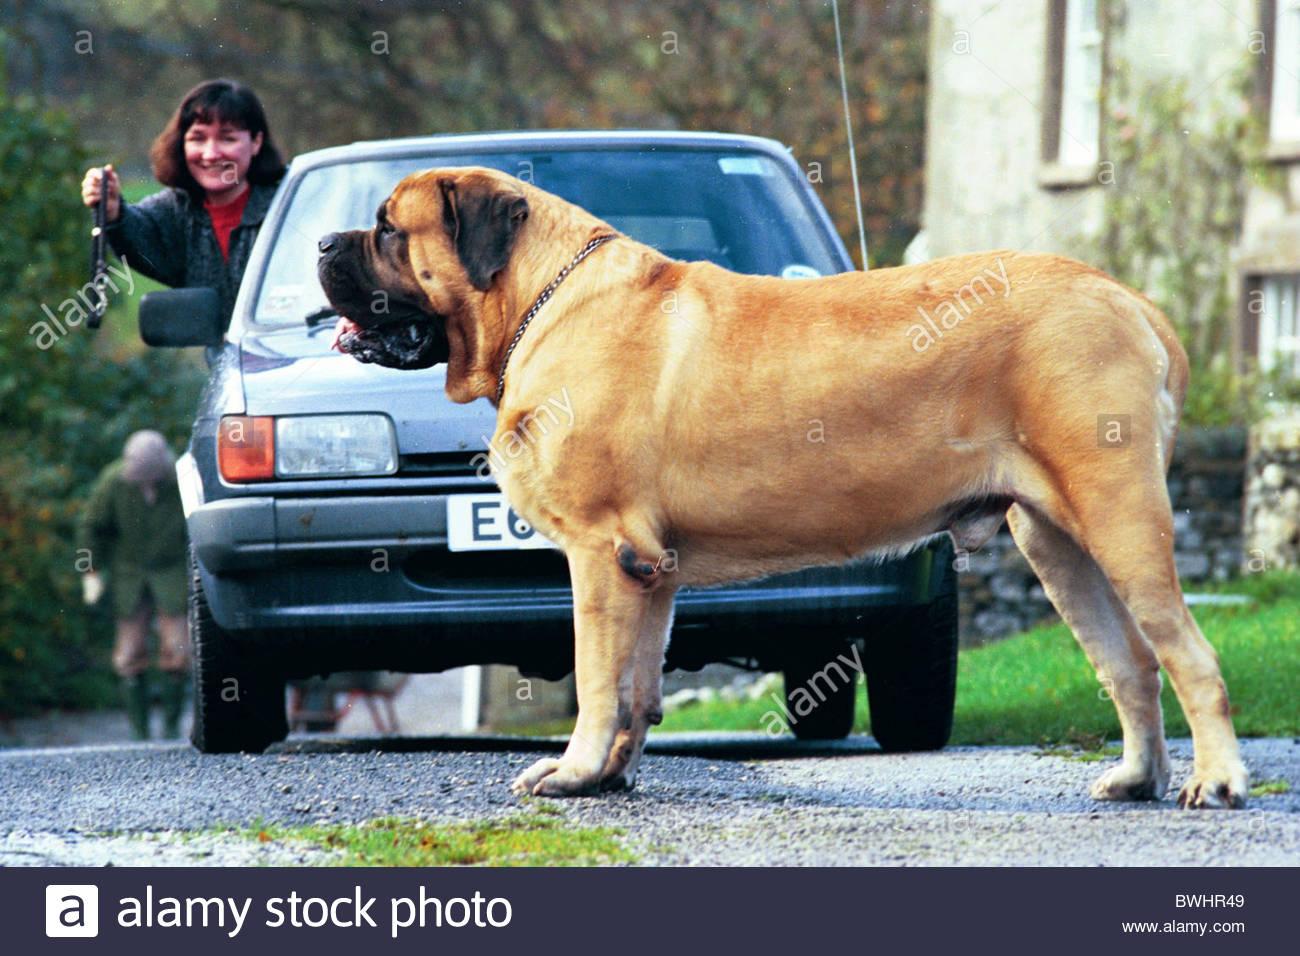 Worlds biggest dog hercules